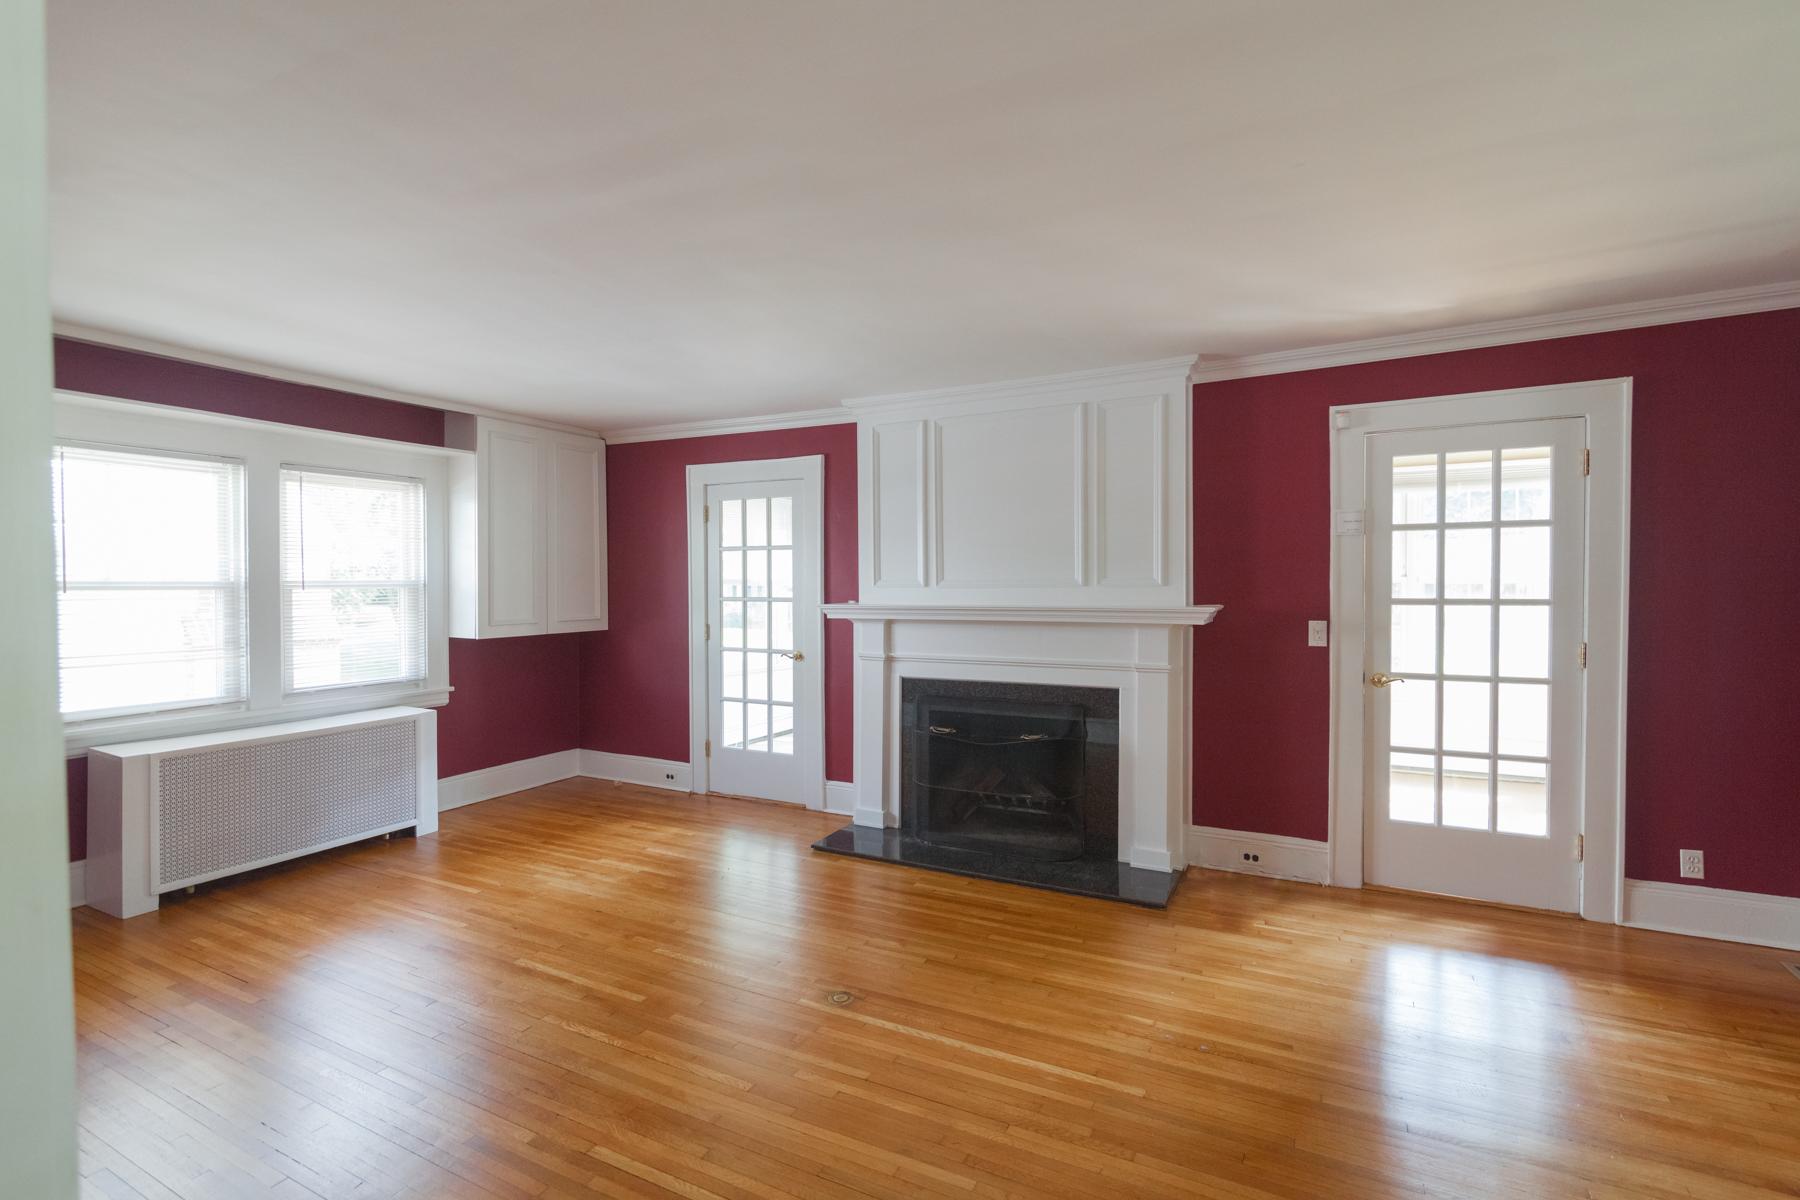 37 Vanderburgh Ave - Living Room alt-354